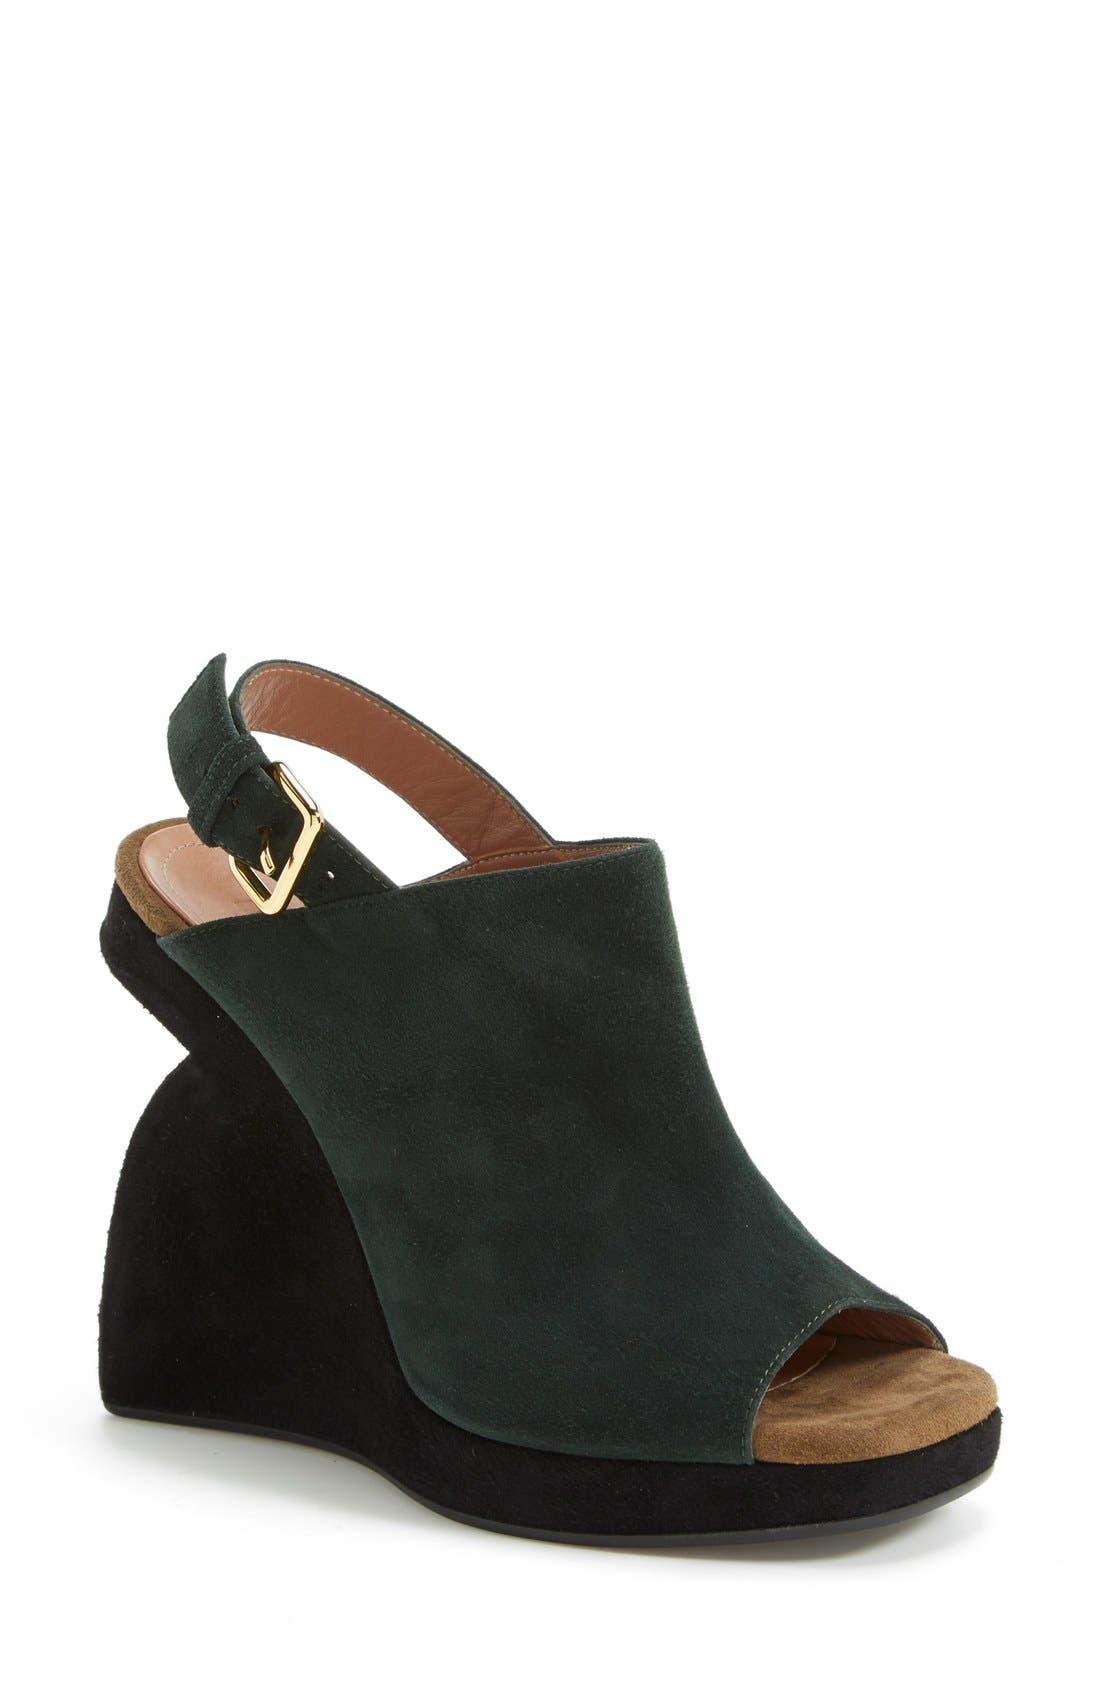 Alternate Image 1 Selected - Marni Slingback Wedge Sandal (Women)